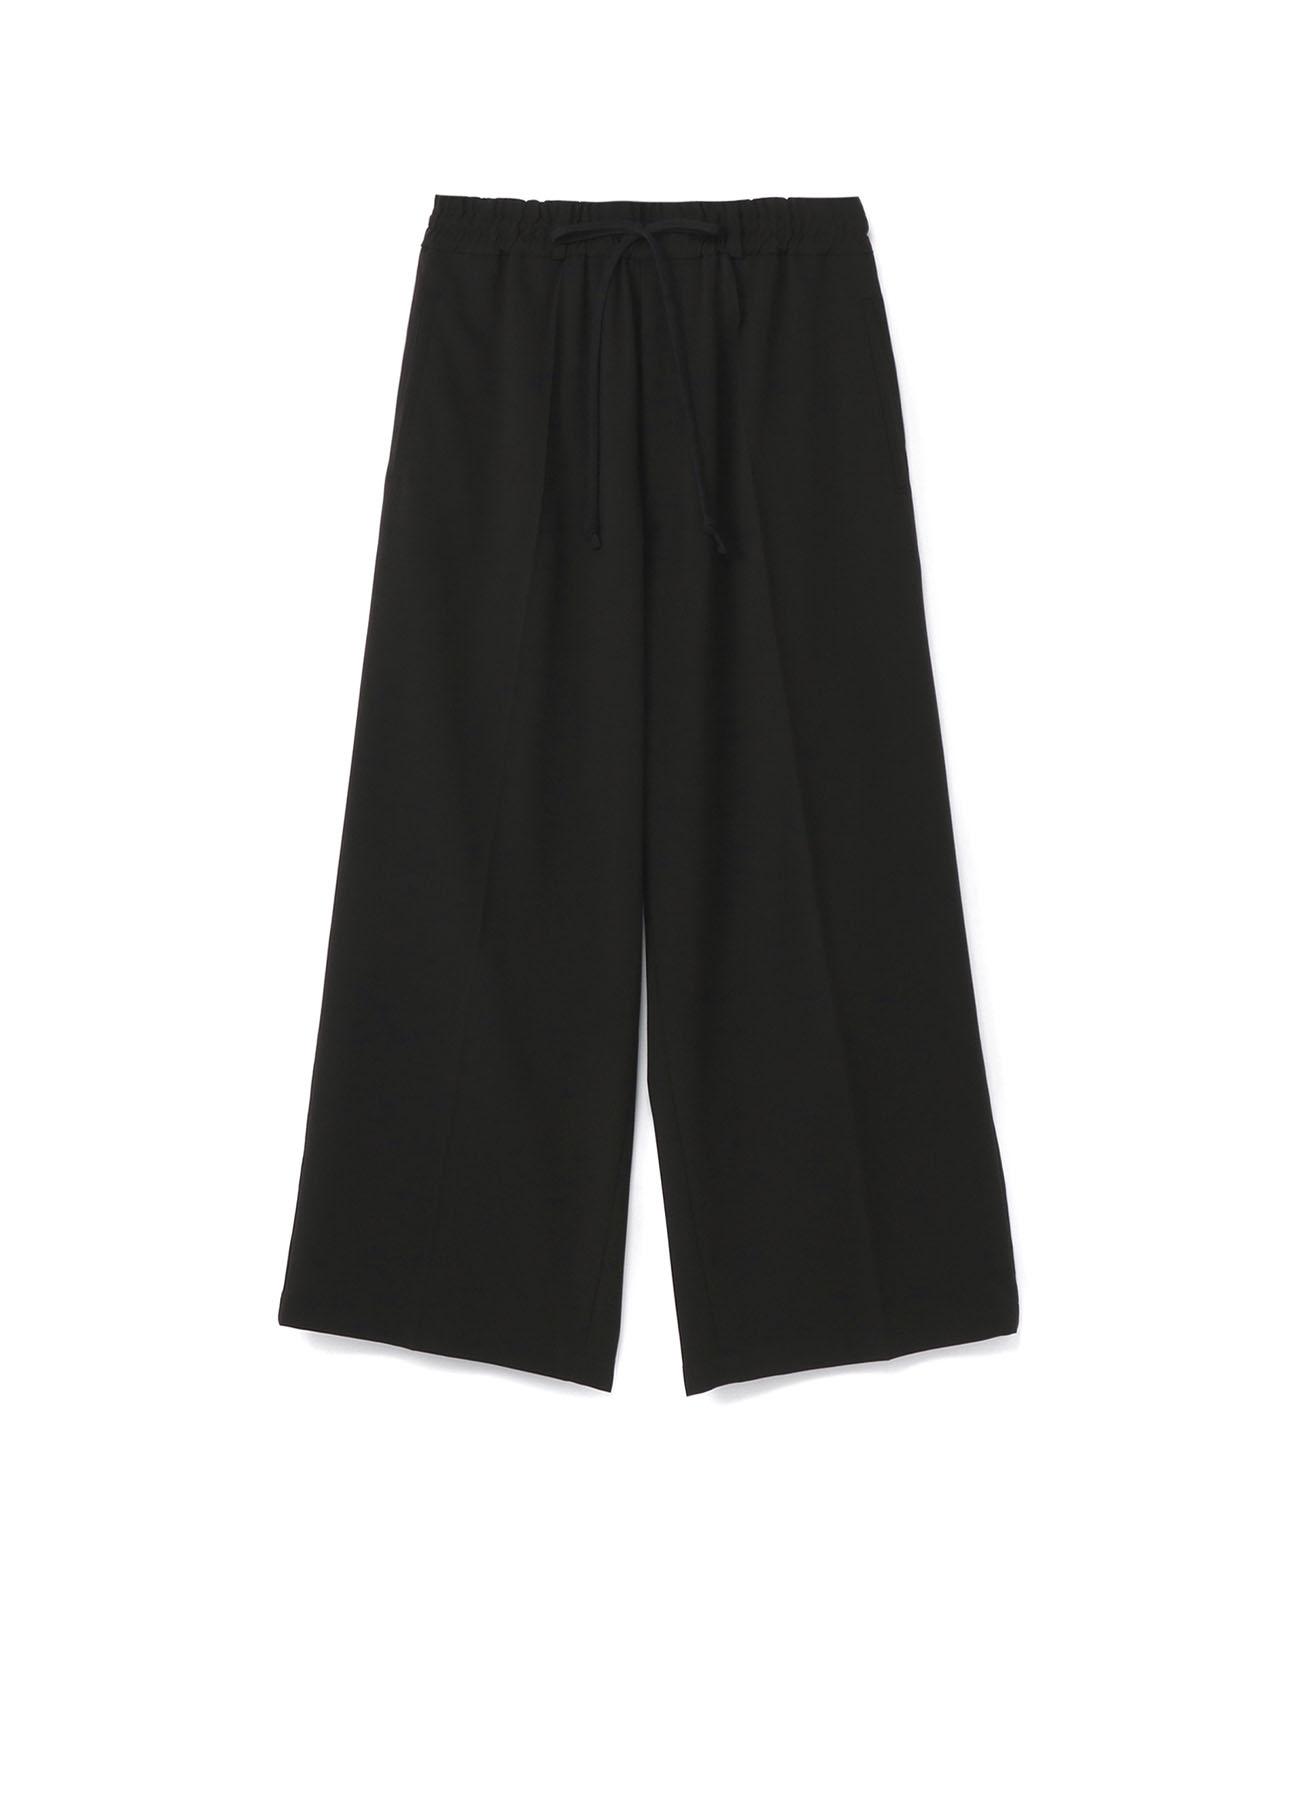 Pe/Rayon Gabardine Stretch Track Wide Pants